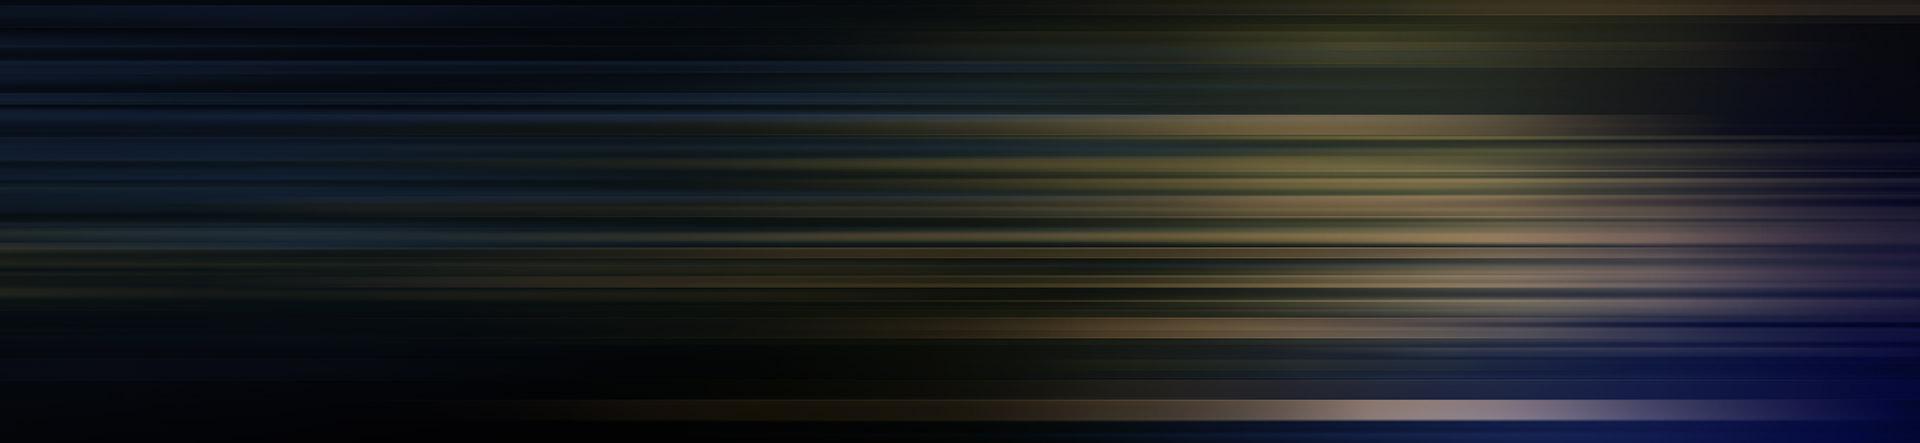 LineMax Banner